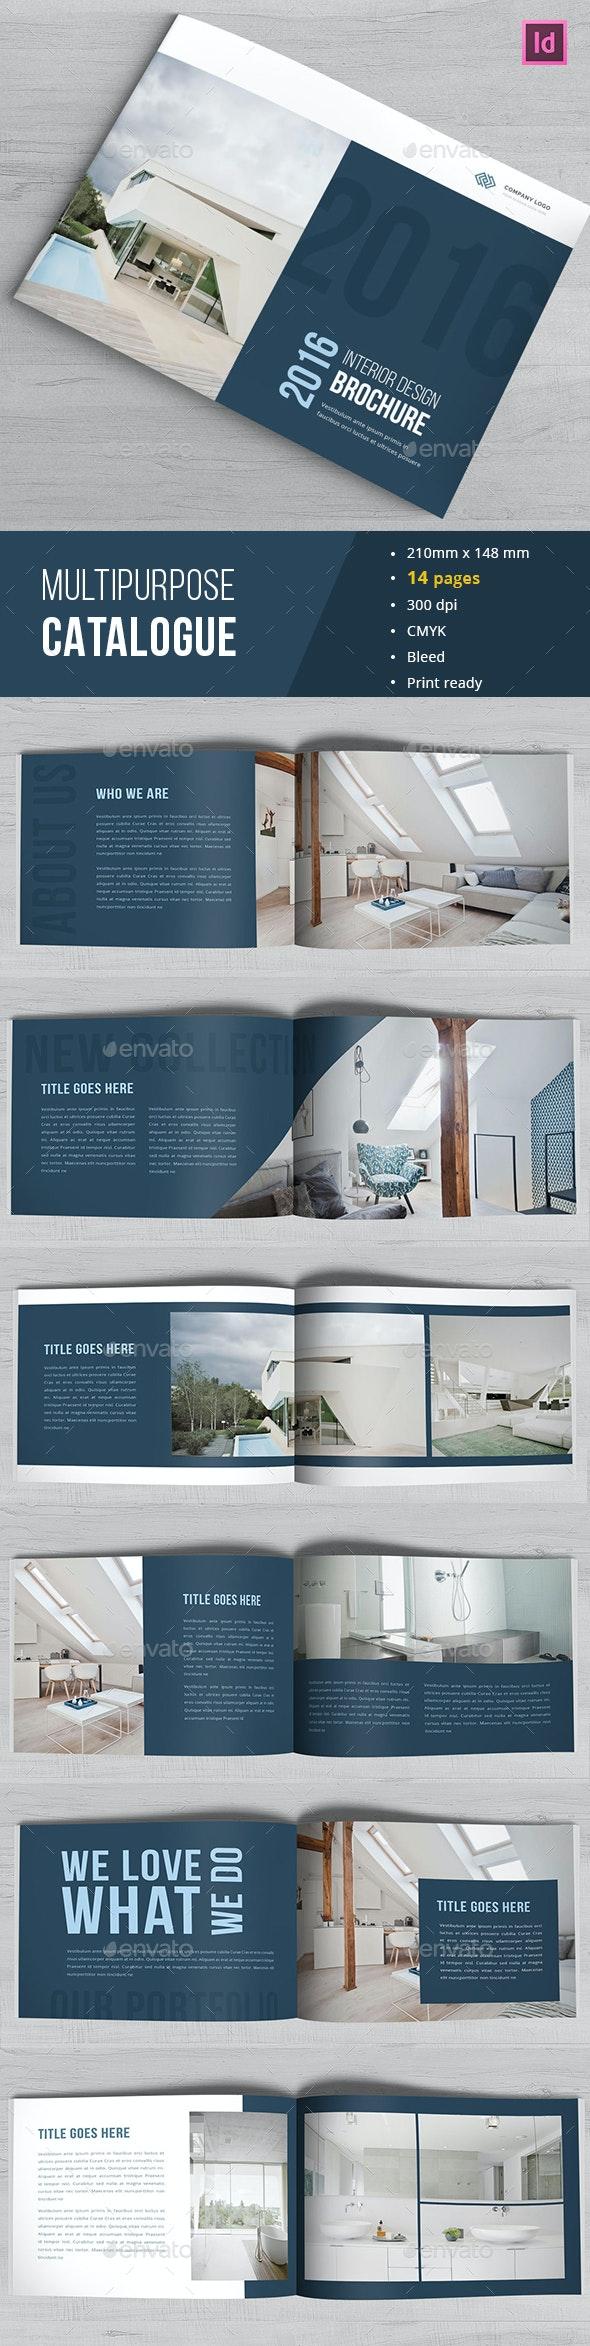 Indesign Portfolio Catalogue - Catalogs Brochures